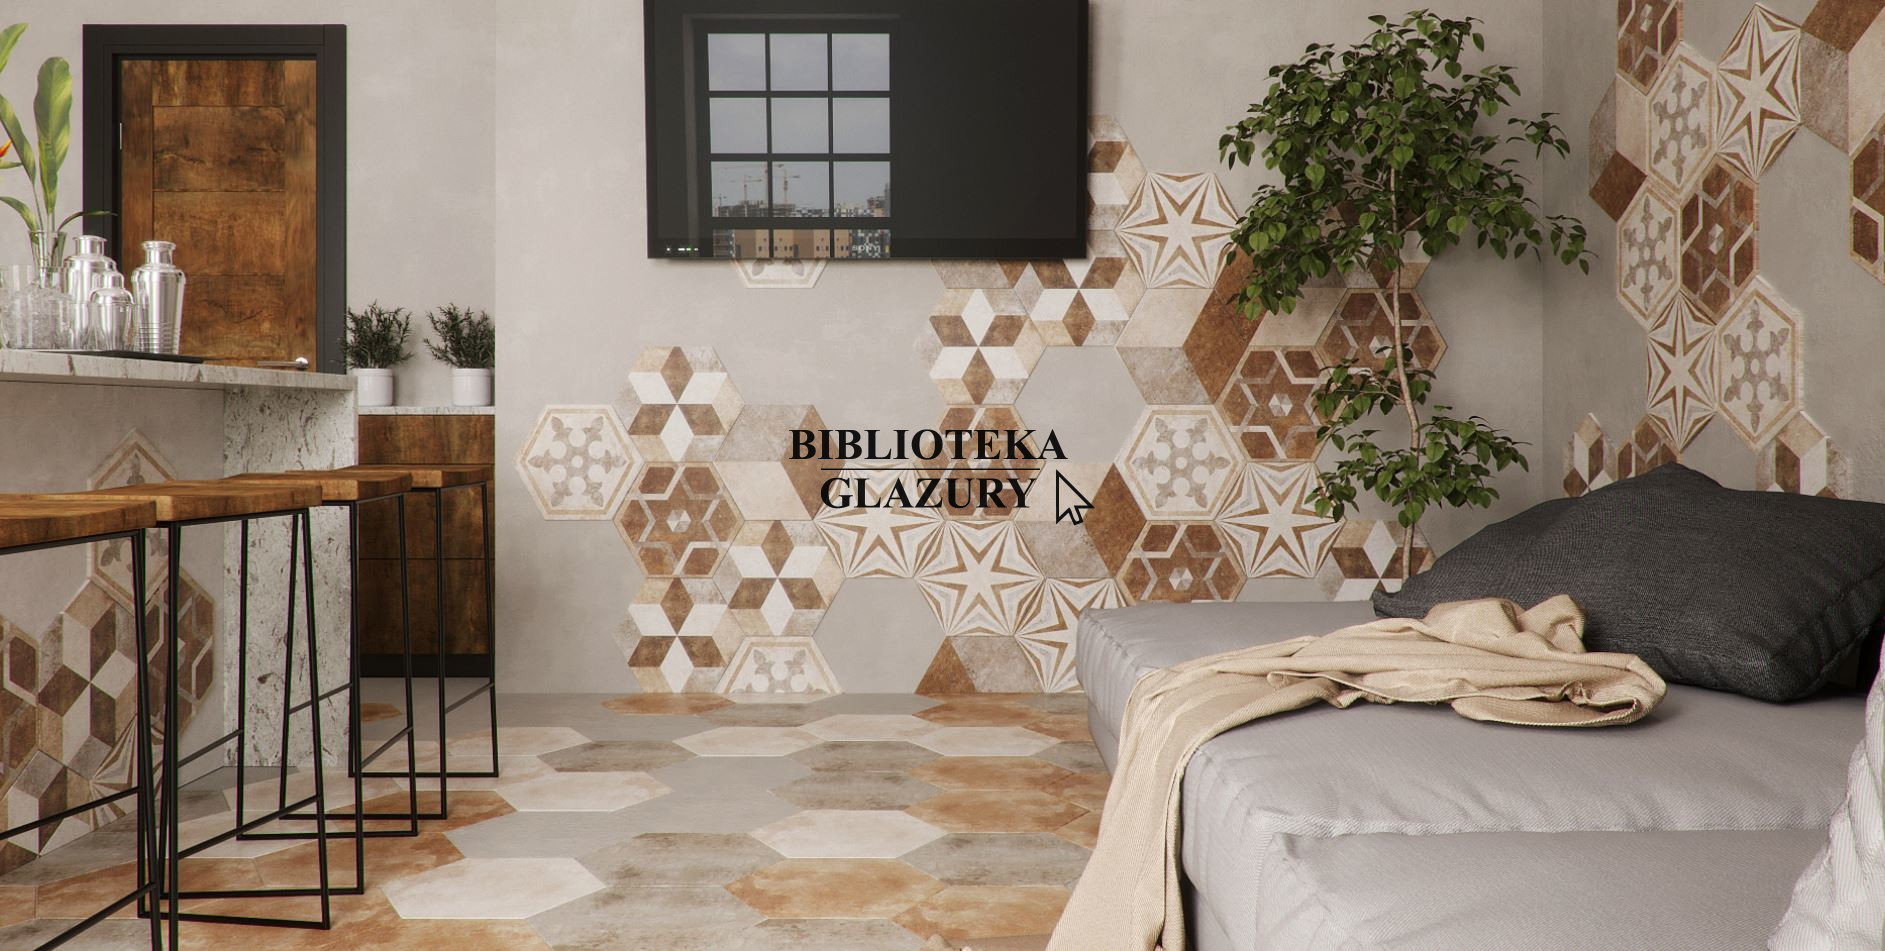 Płytki Heksagonalne Beżowe Fioranese Heritage Deco Texture 5 345 X 40